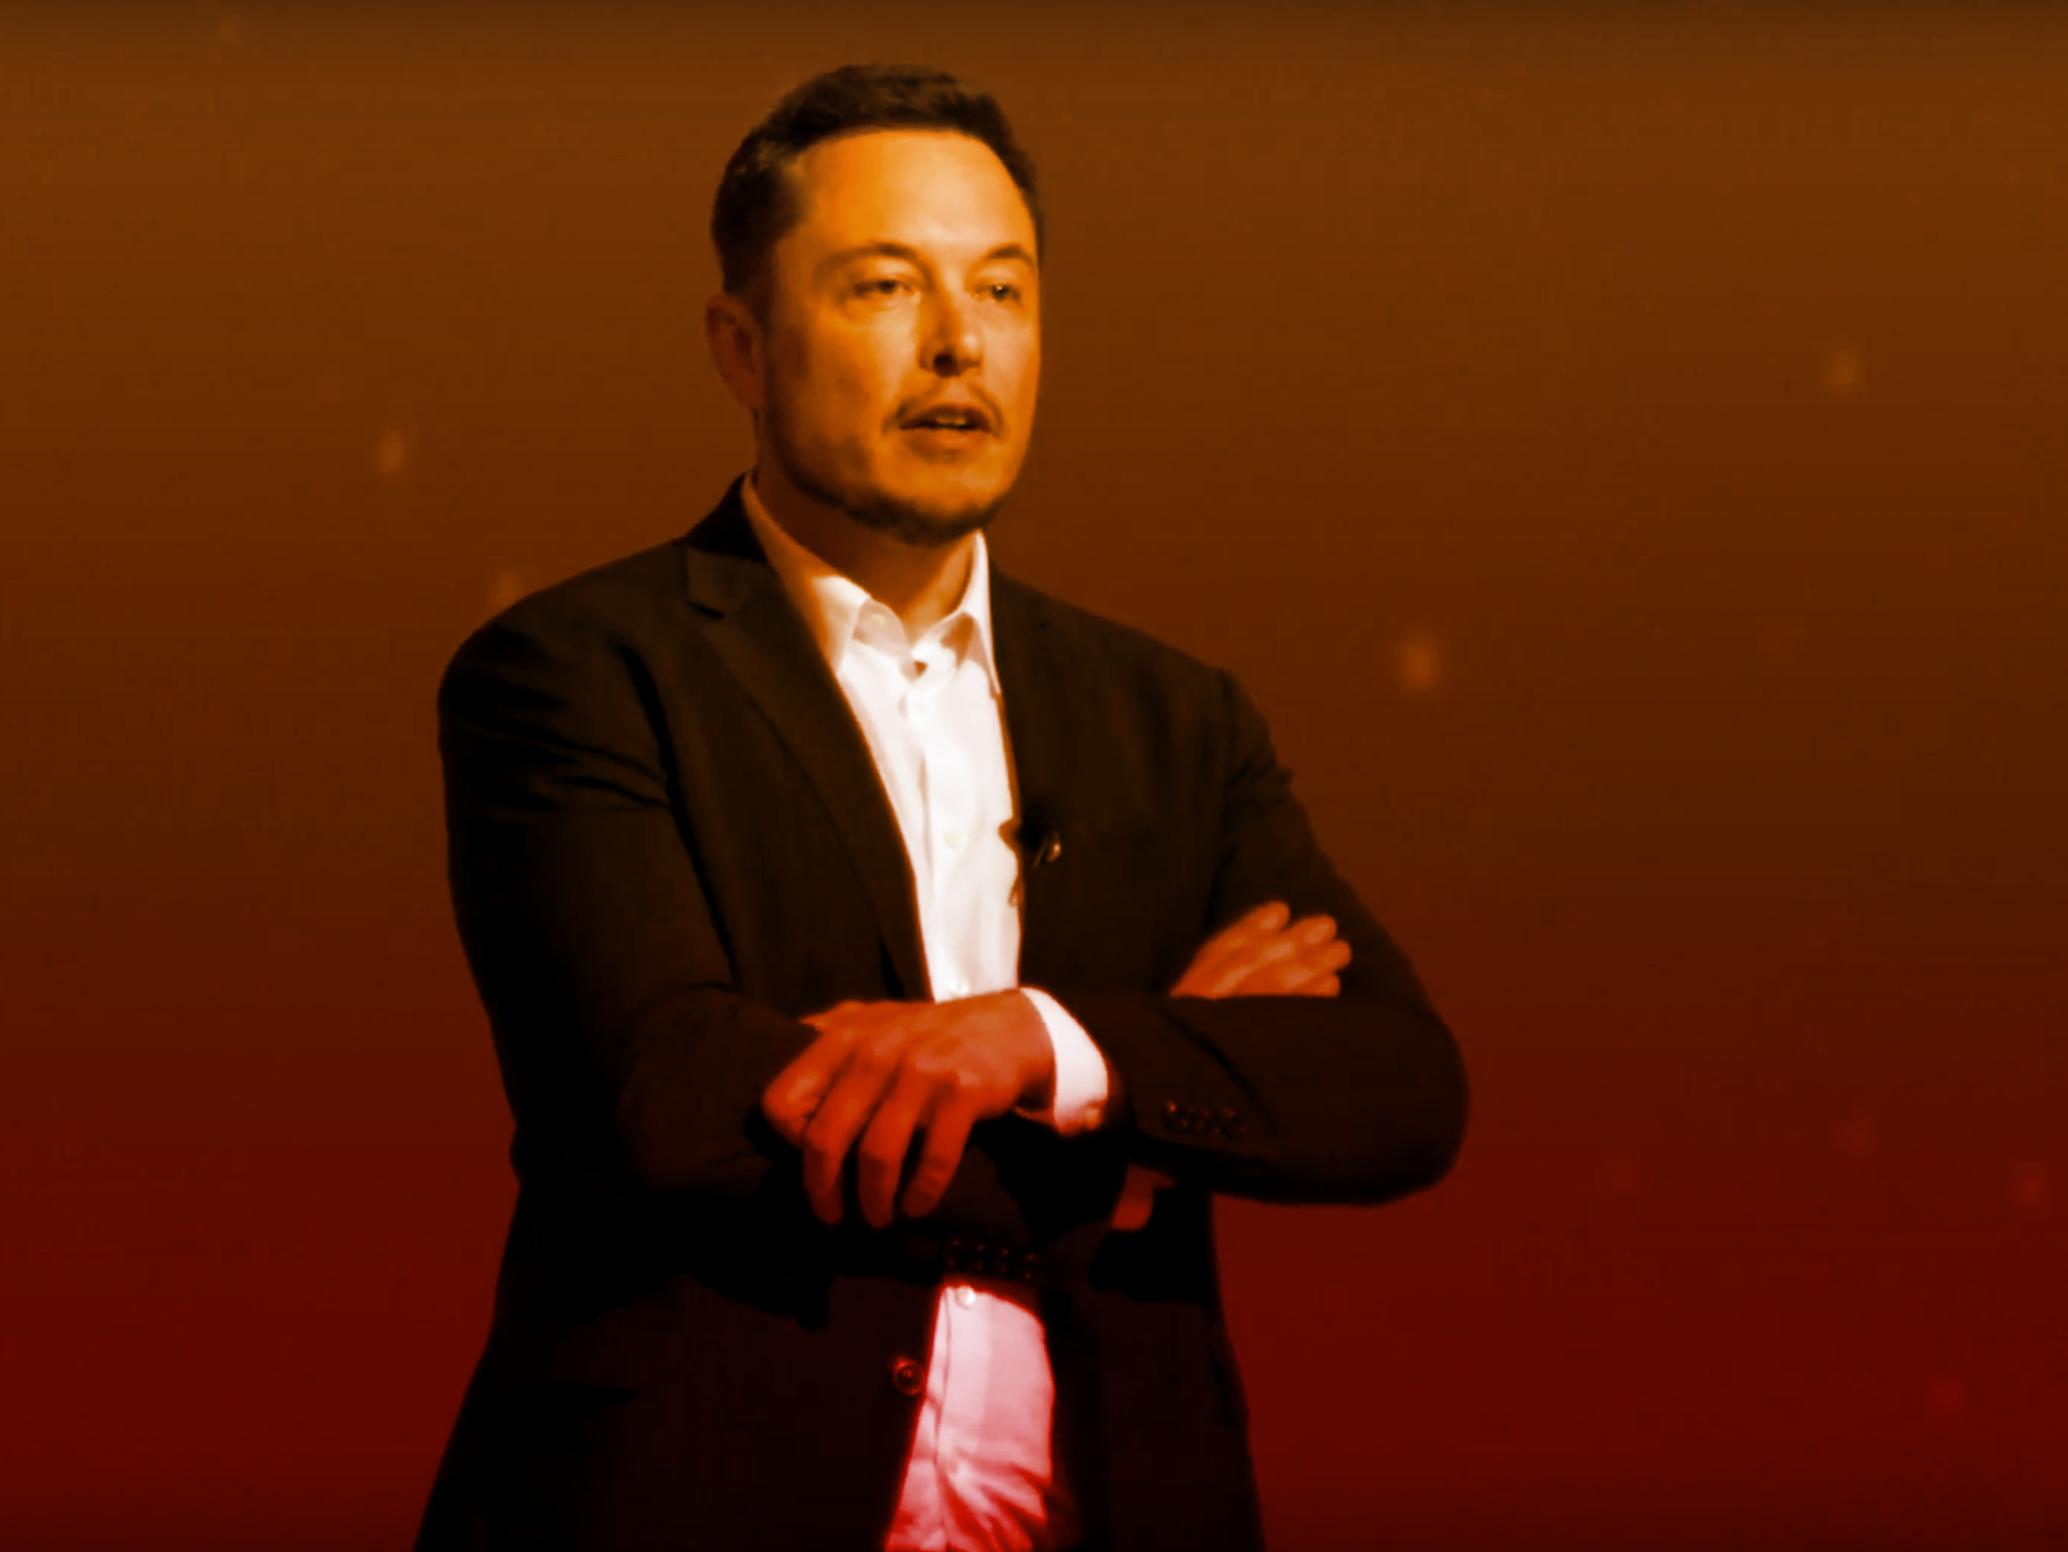 Elon Musk Would Like to Visit Mars, Needs to Plan in Case He Dies